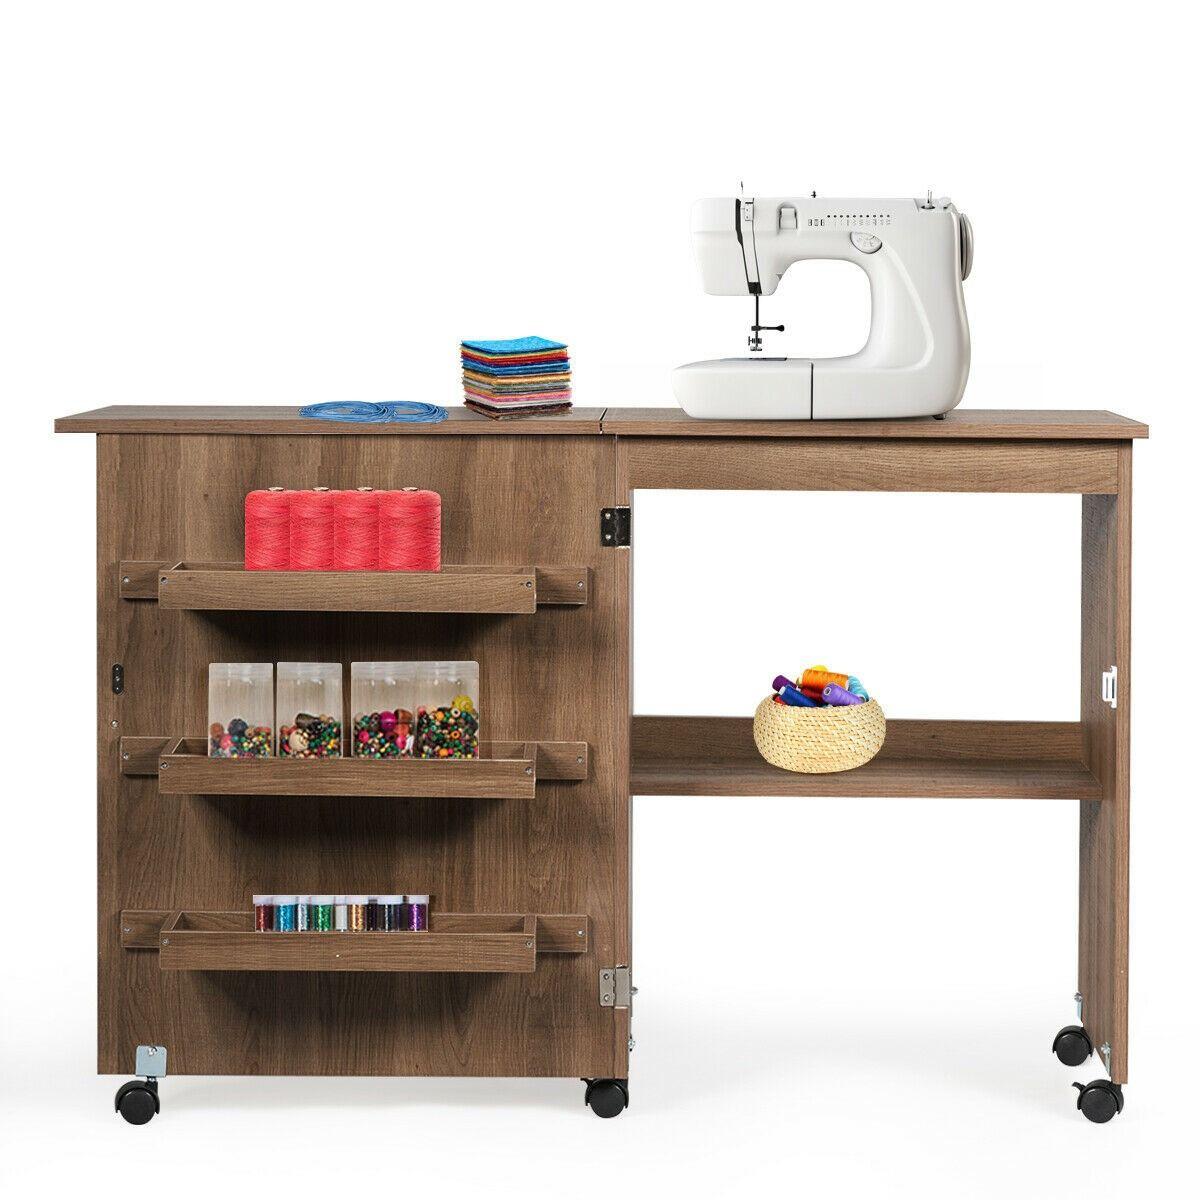 50++ Folding craft storage cabinet ideas in 2021